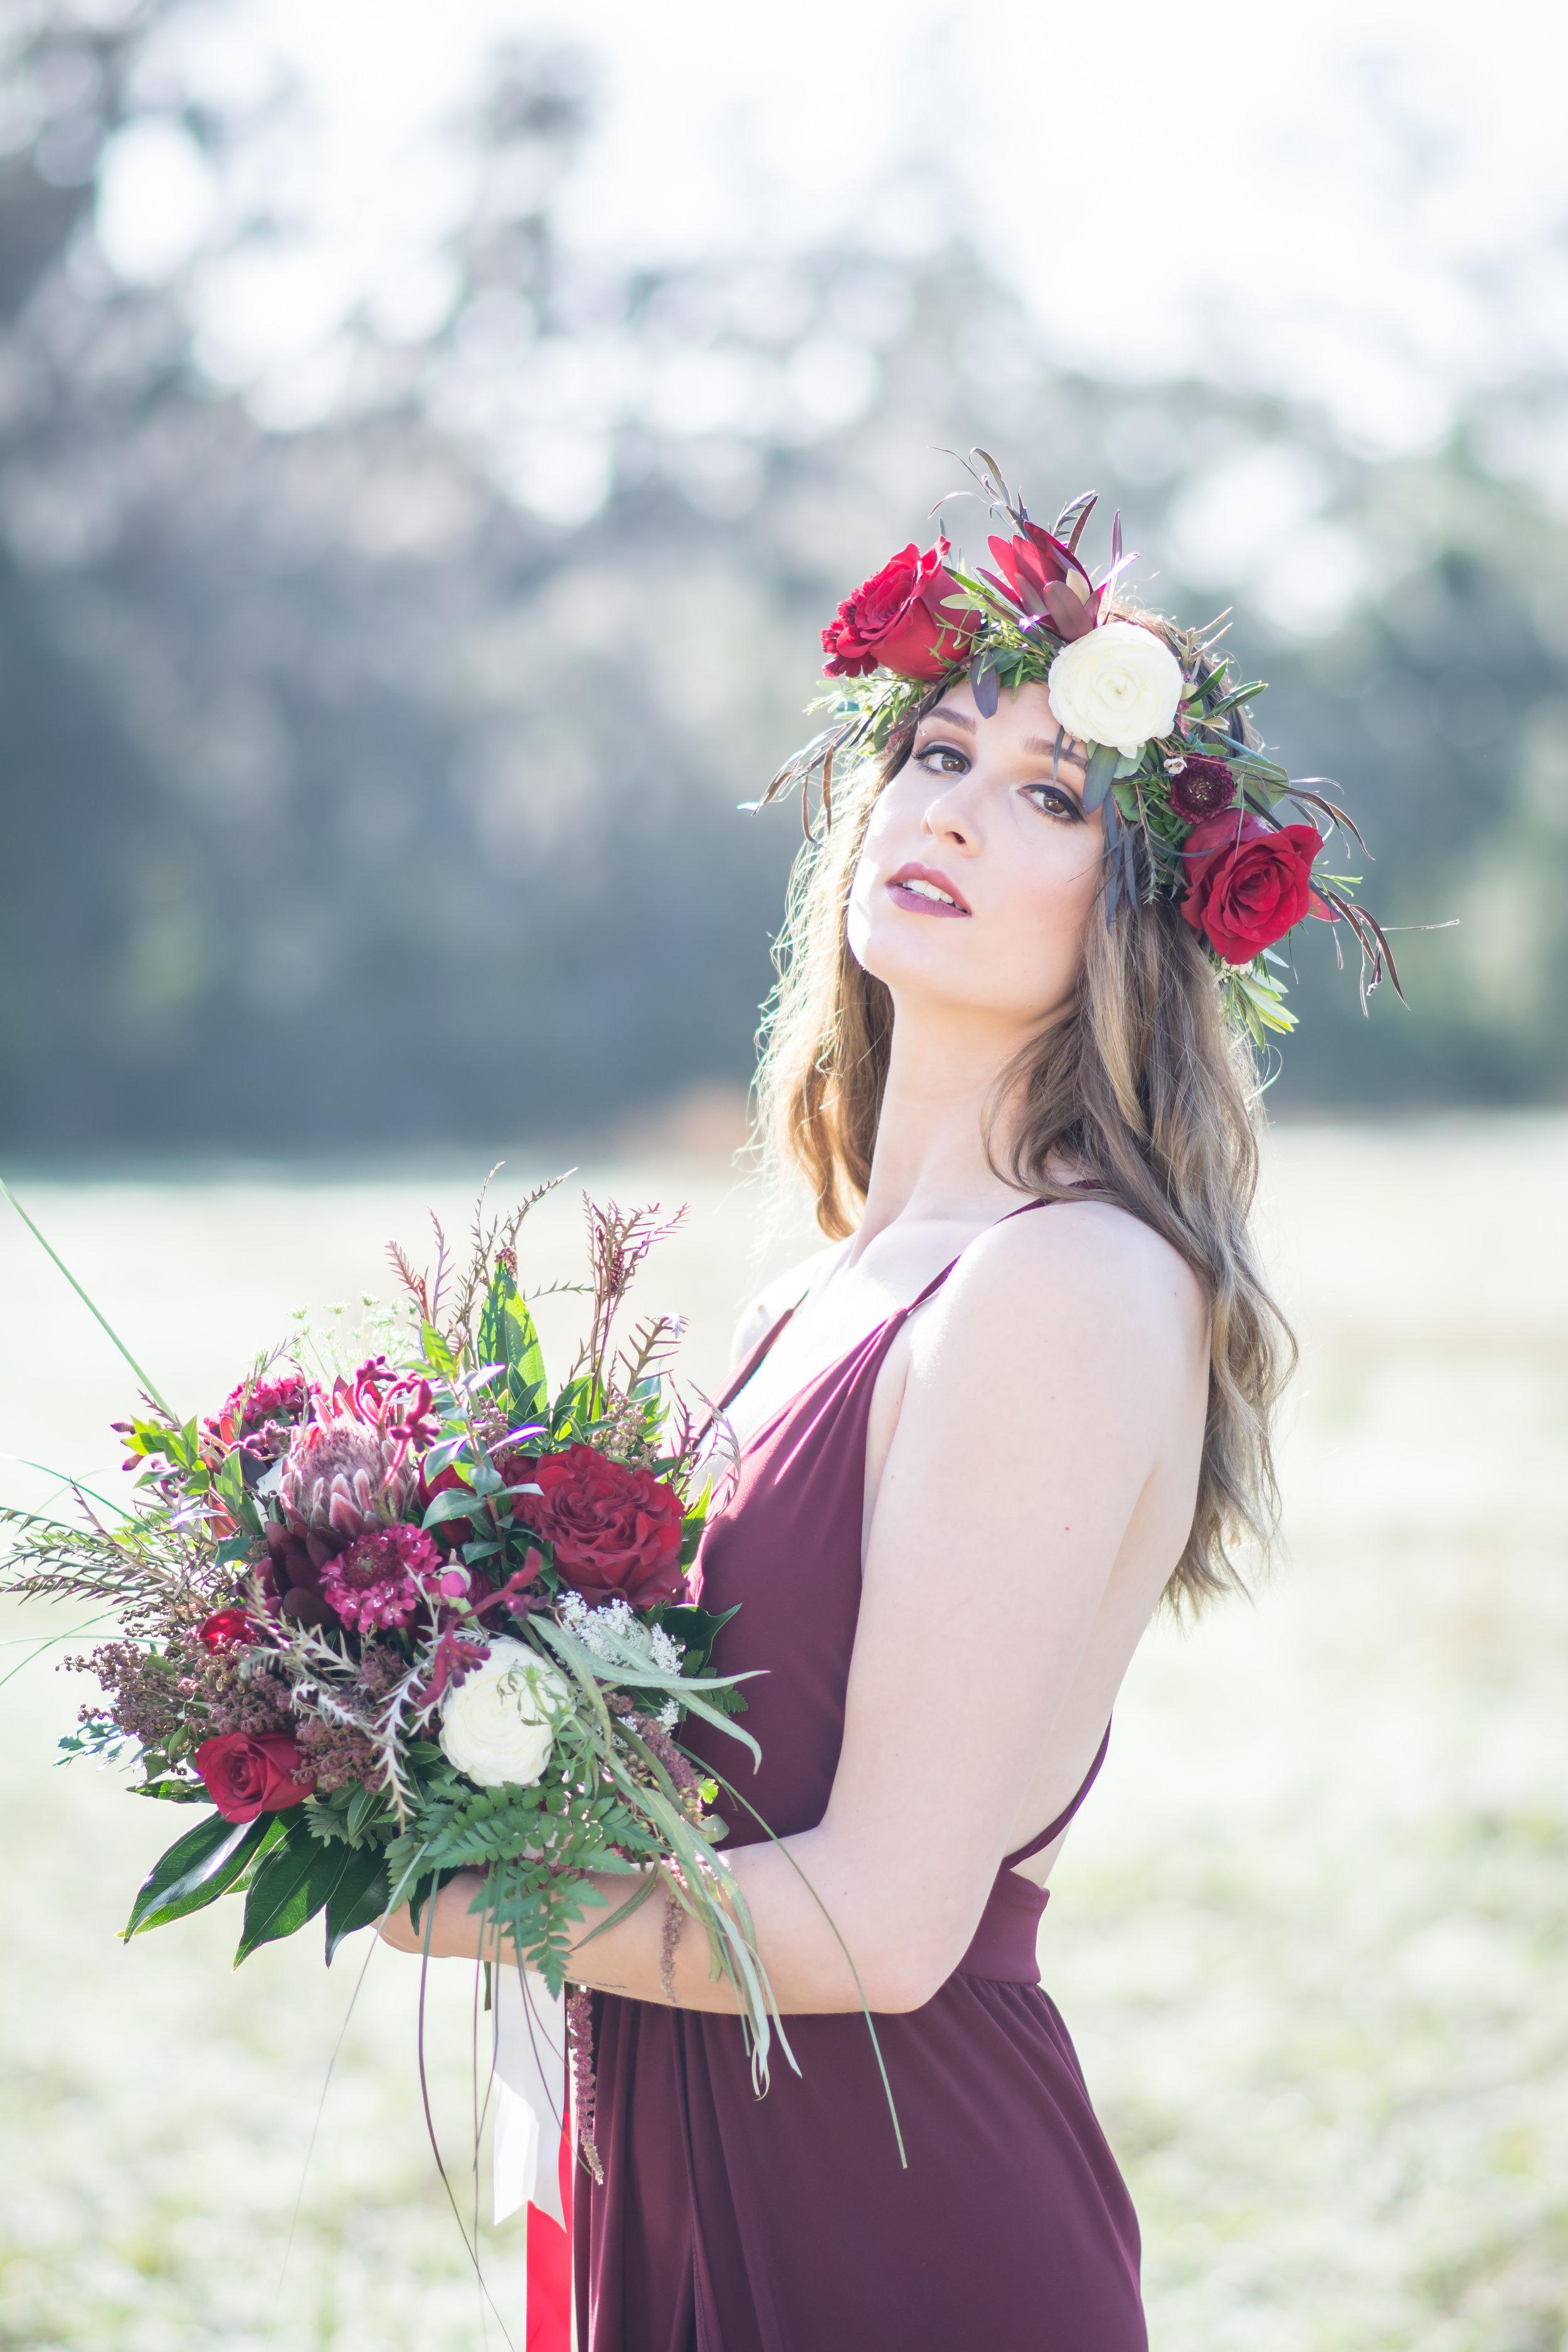 whimsical-bridal-inspiration-fashion-photoshoot-geneva-photographer-yanitza-ninett-48.jpg